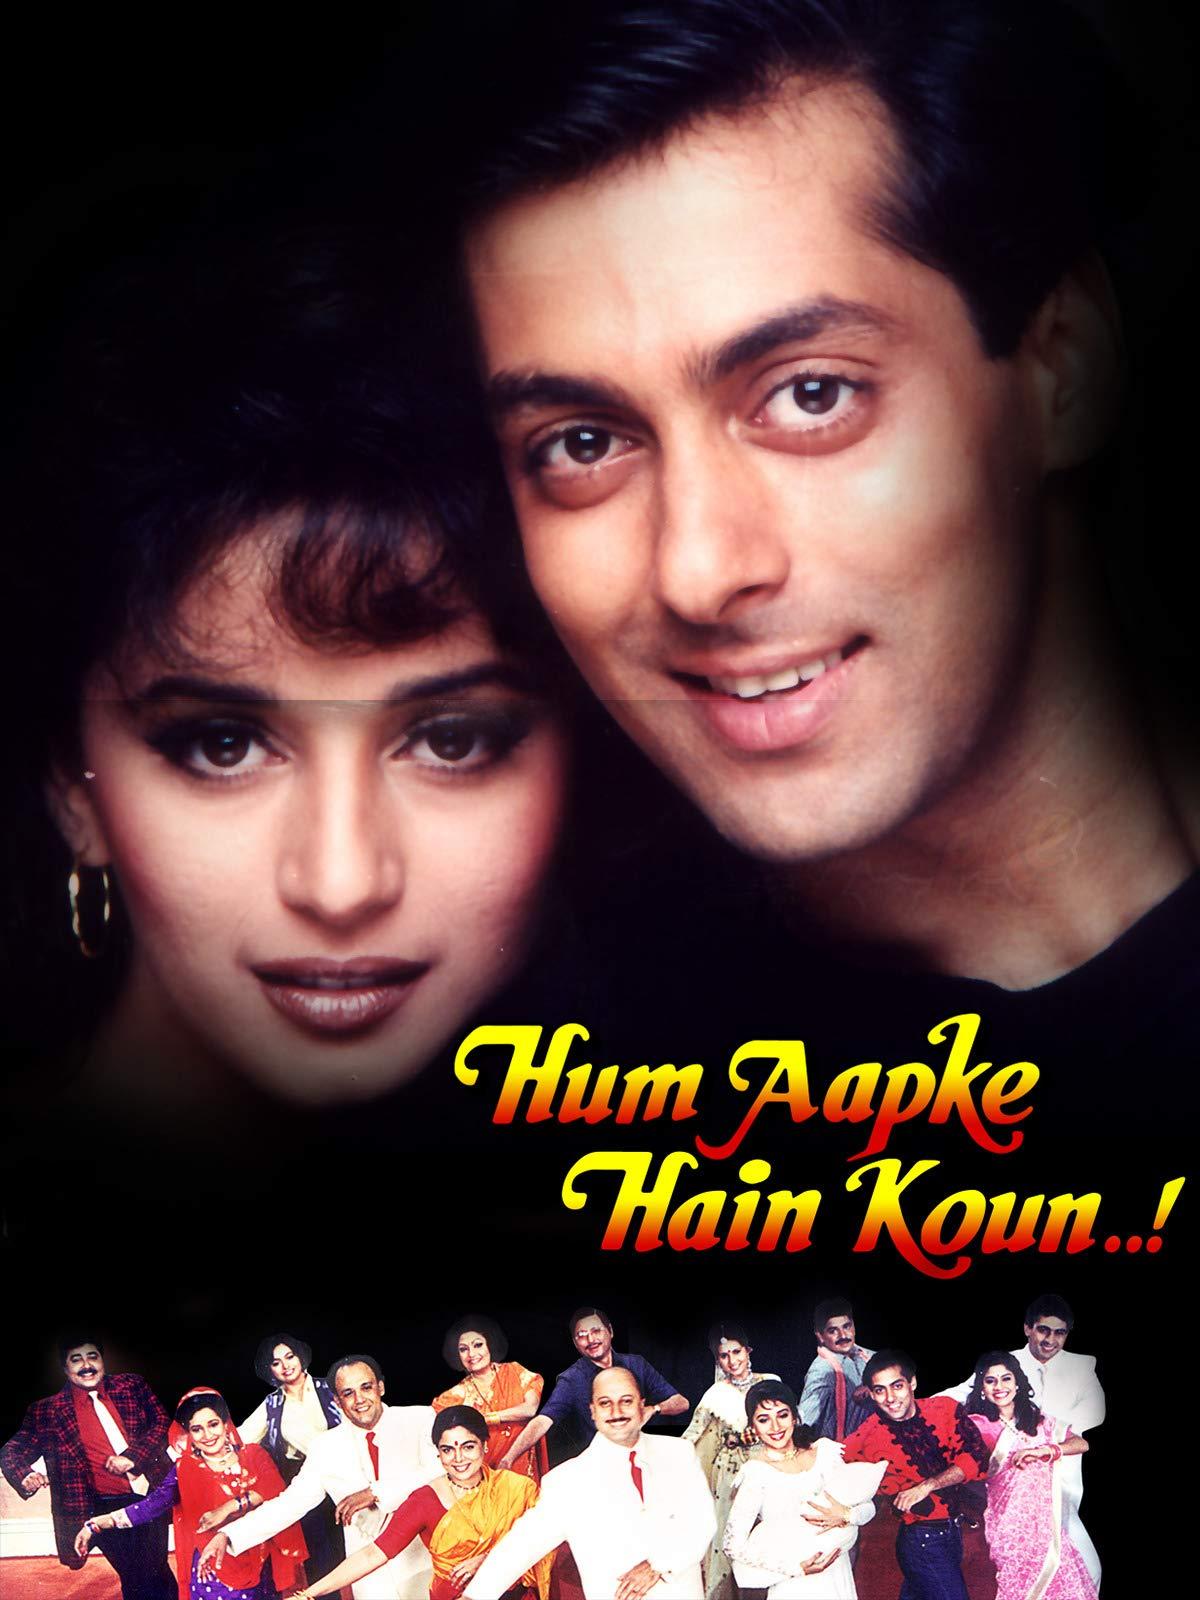 Hum Aapke Hain Koun…!.• 1994 BD50 Untouched BluRay ULTRA. DRs | 43 GB | Parts |